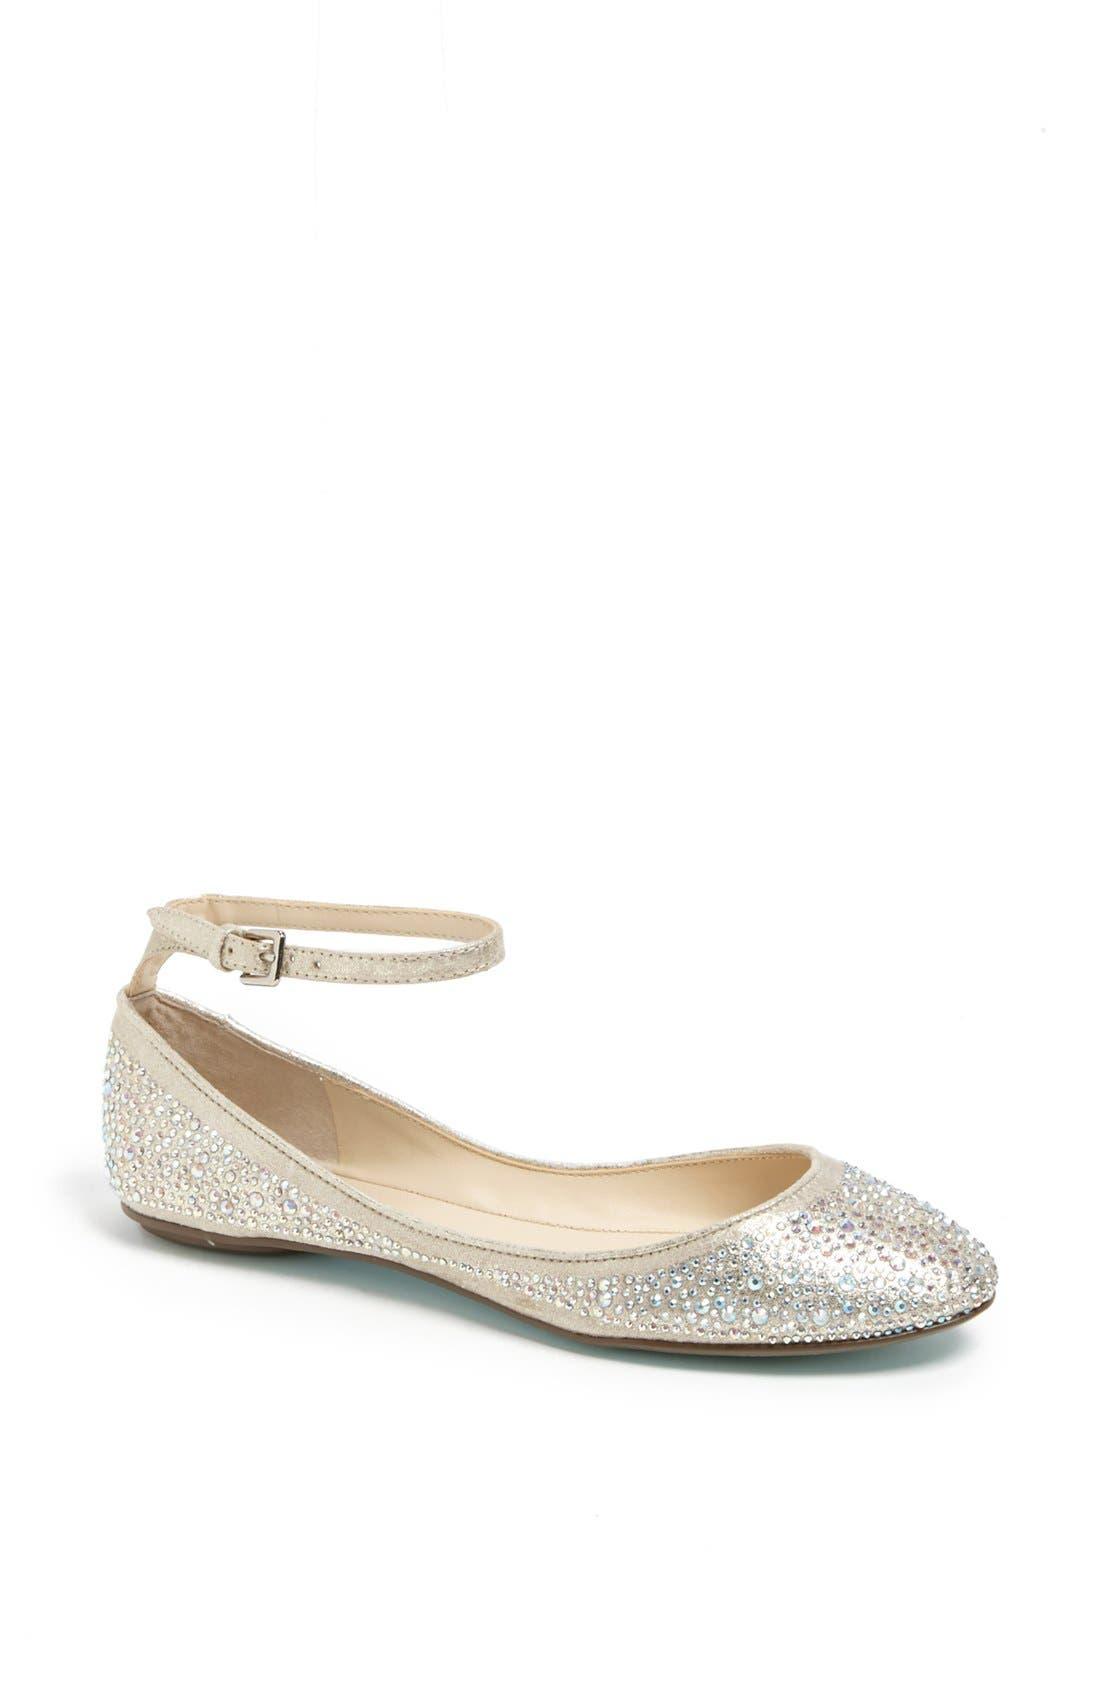 Alternate Image 1 Selected - Betsey Johnson 'Joy' Ankle Strap Crystal Embellished Flat